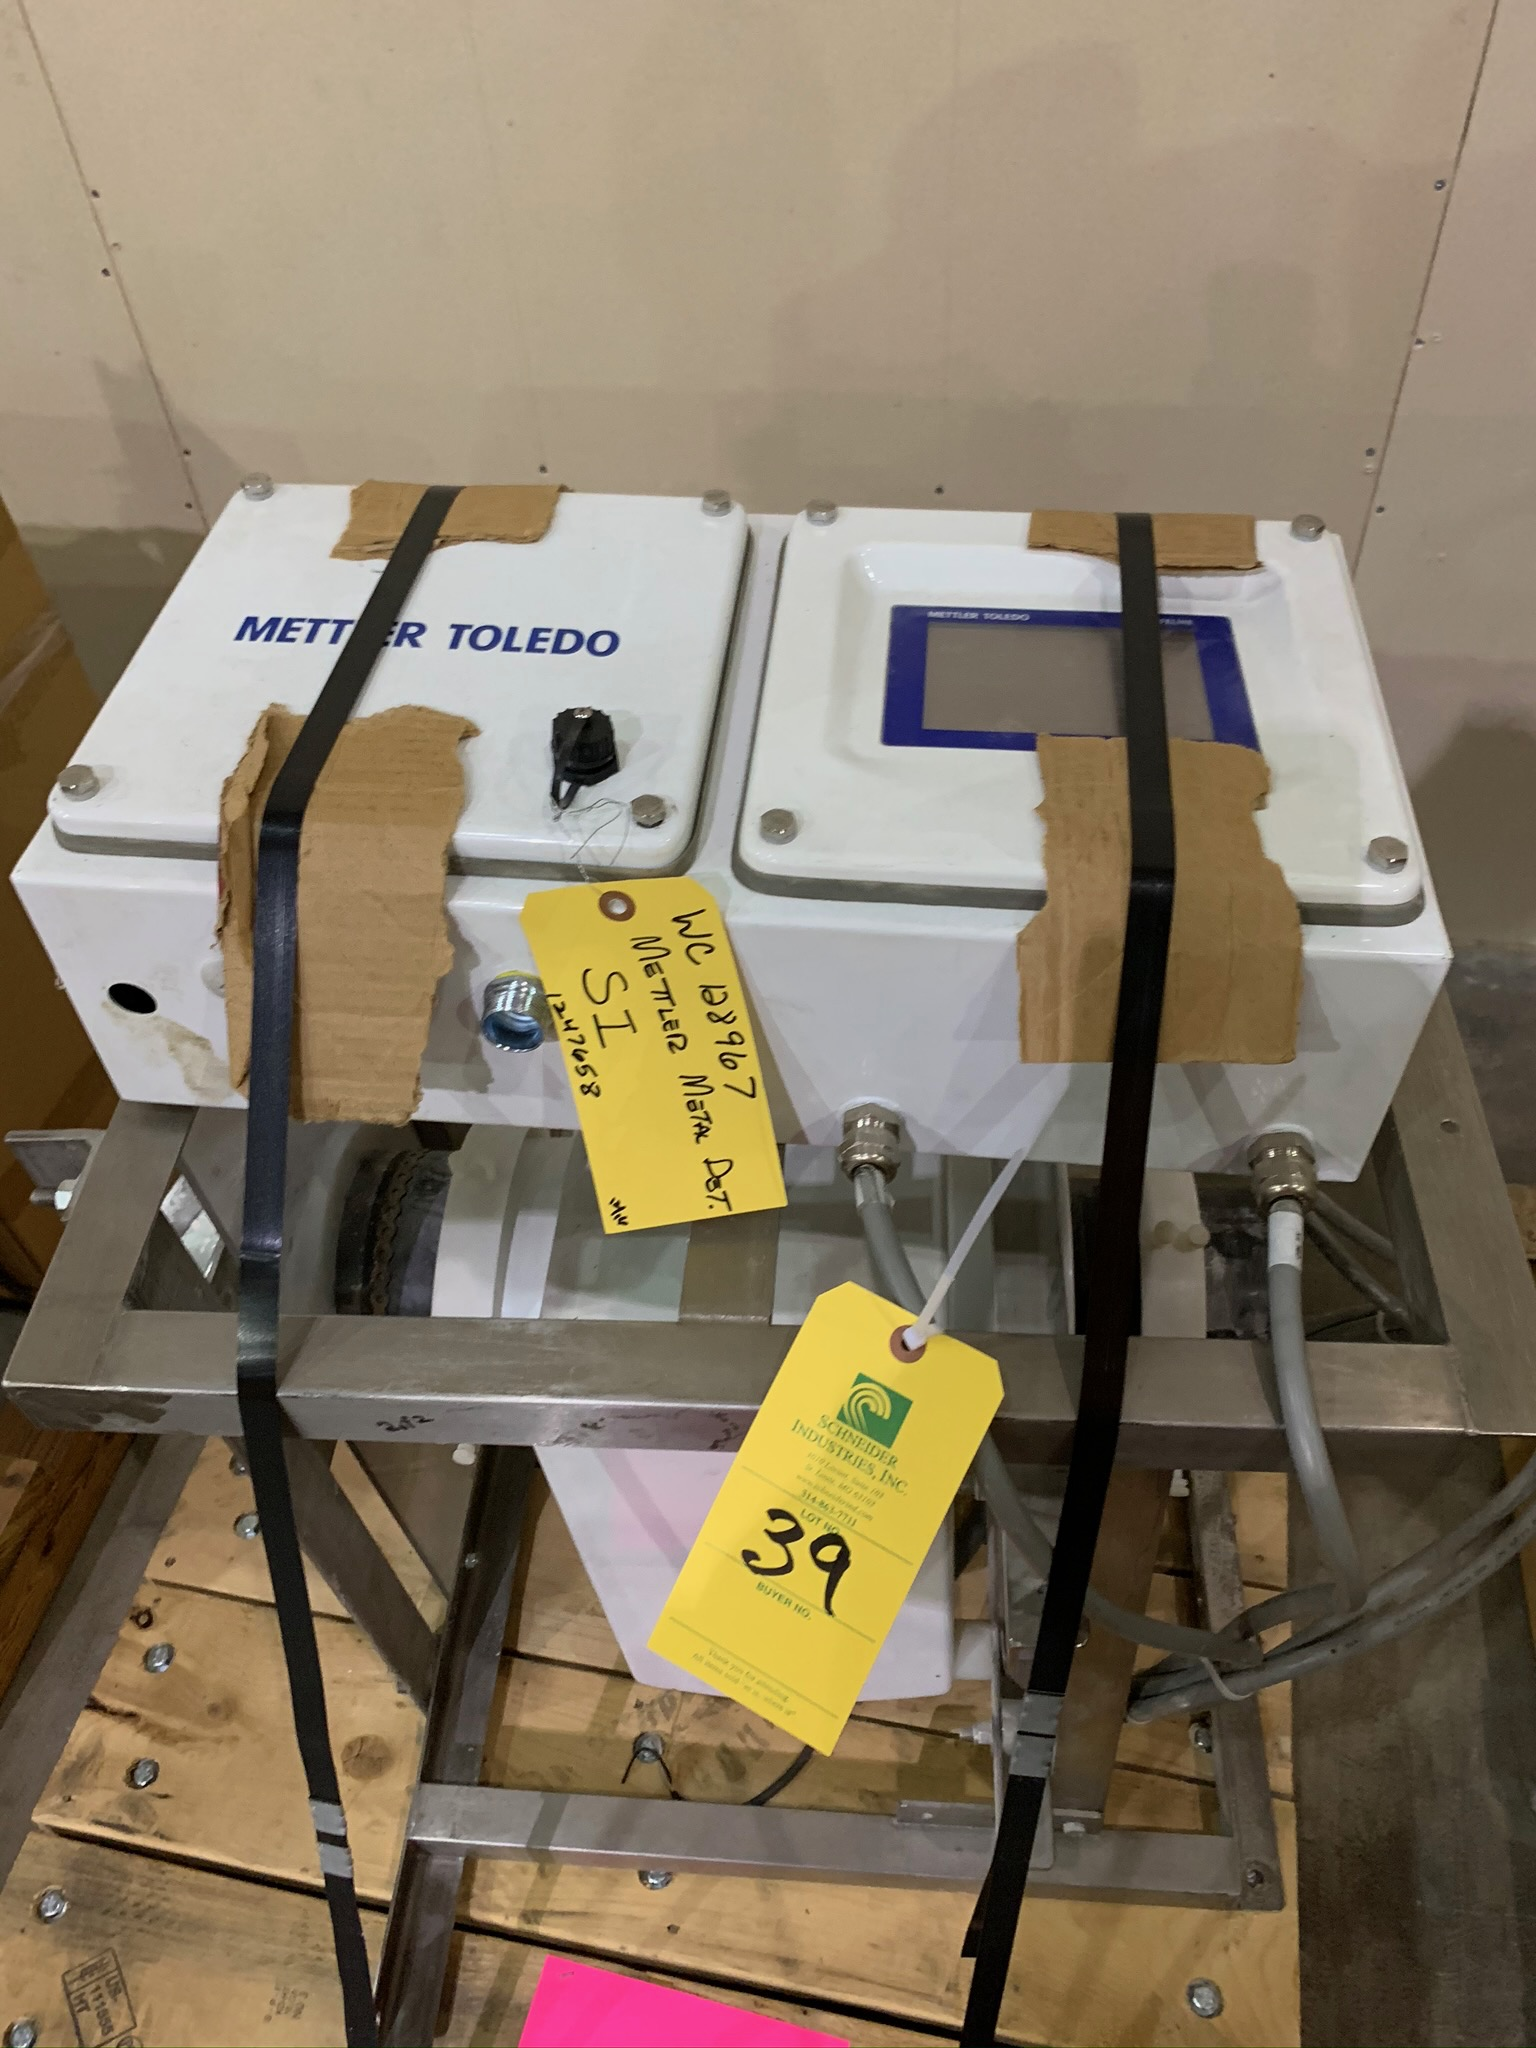 Lot 39 - Mettler Toledo 6 Inch Aperture Flow Through Metal Detector S/N 117774 (Rigging Fee - $50)